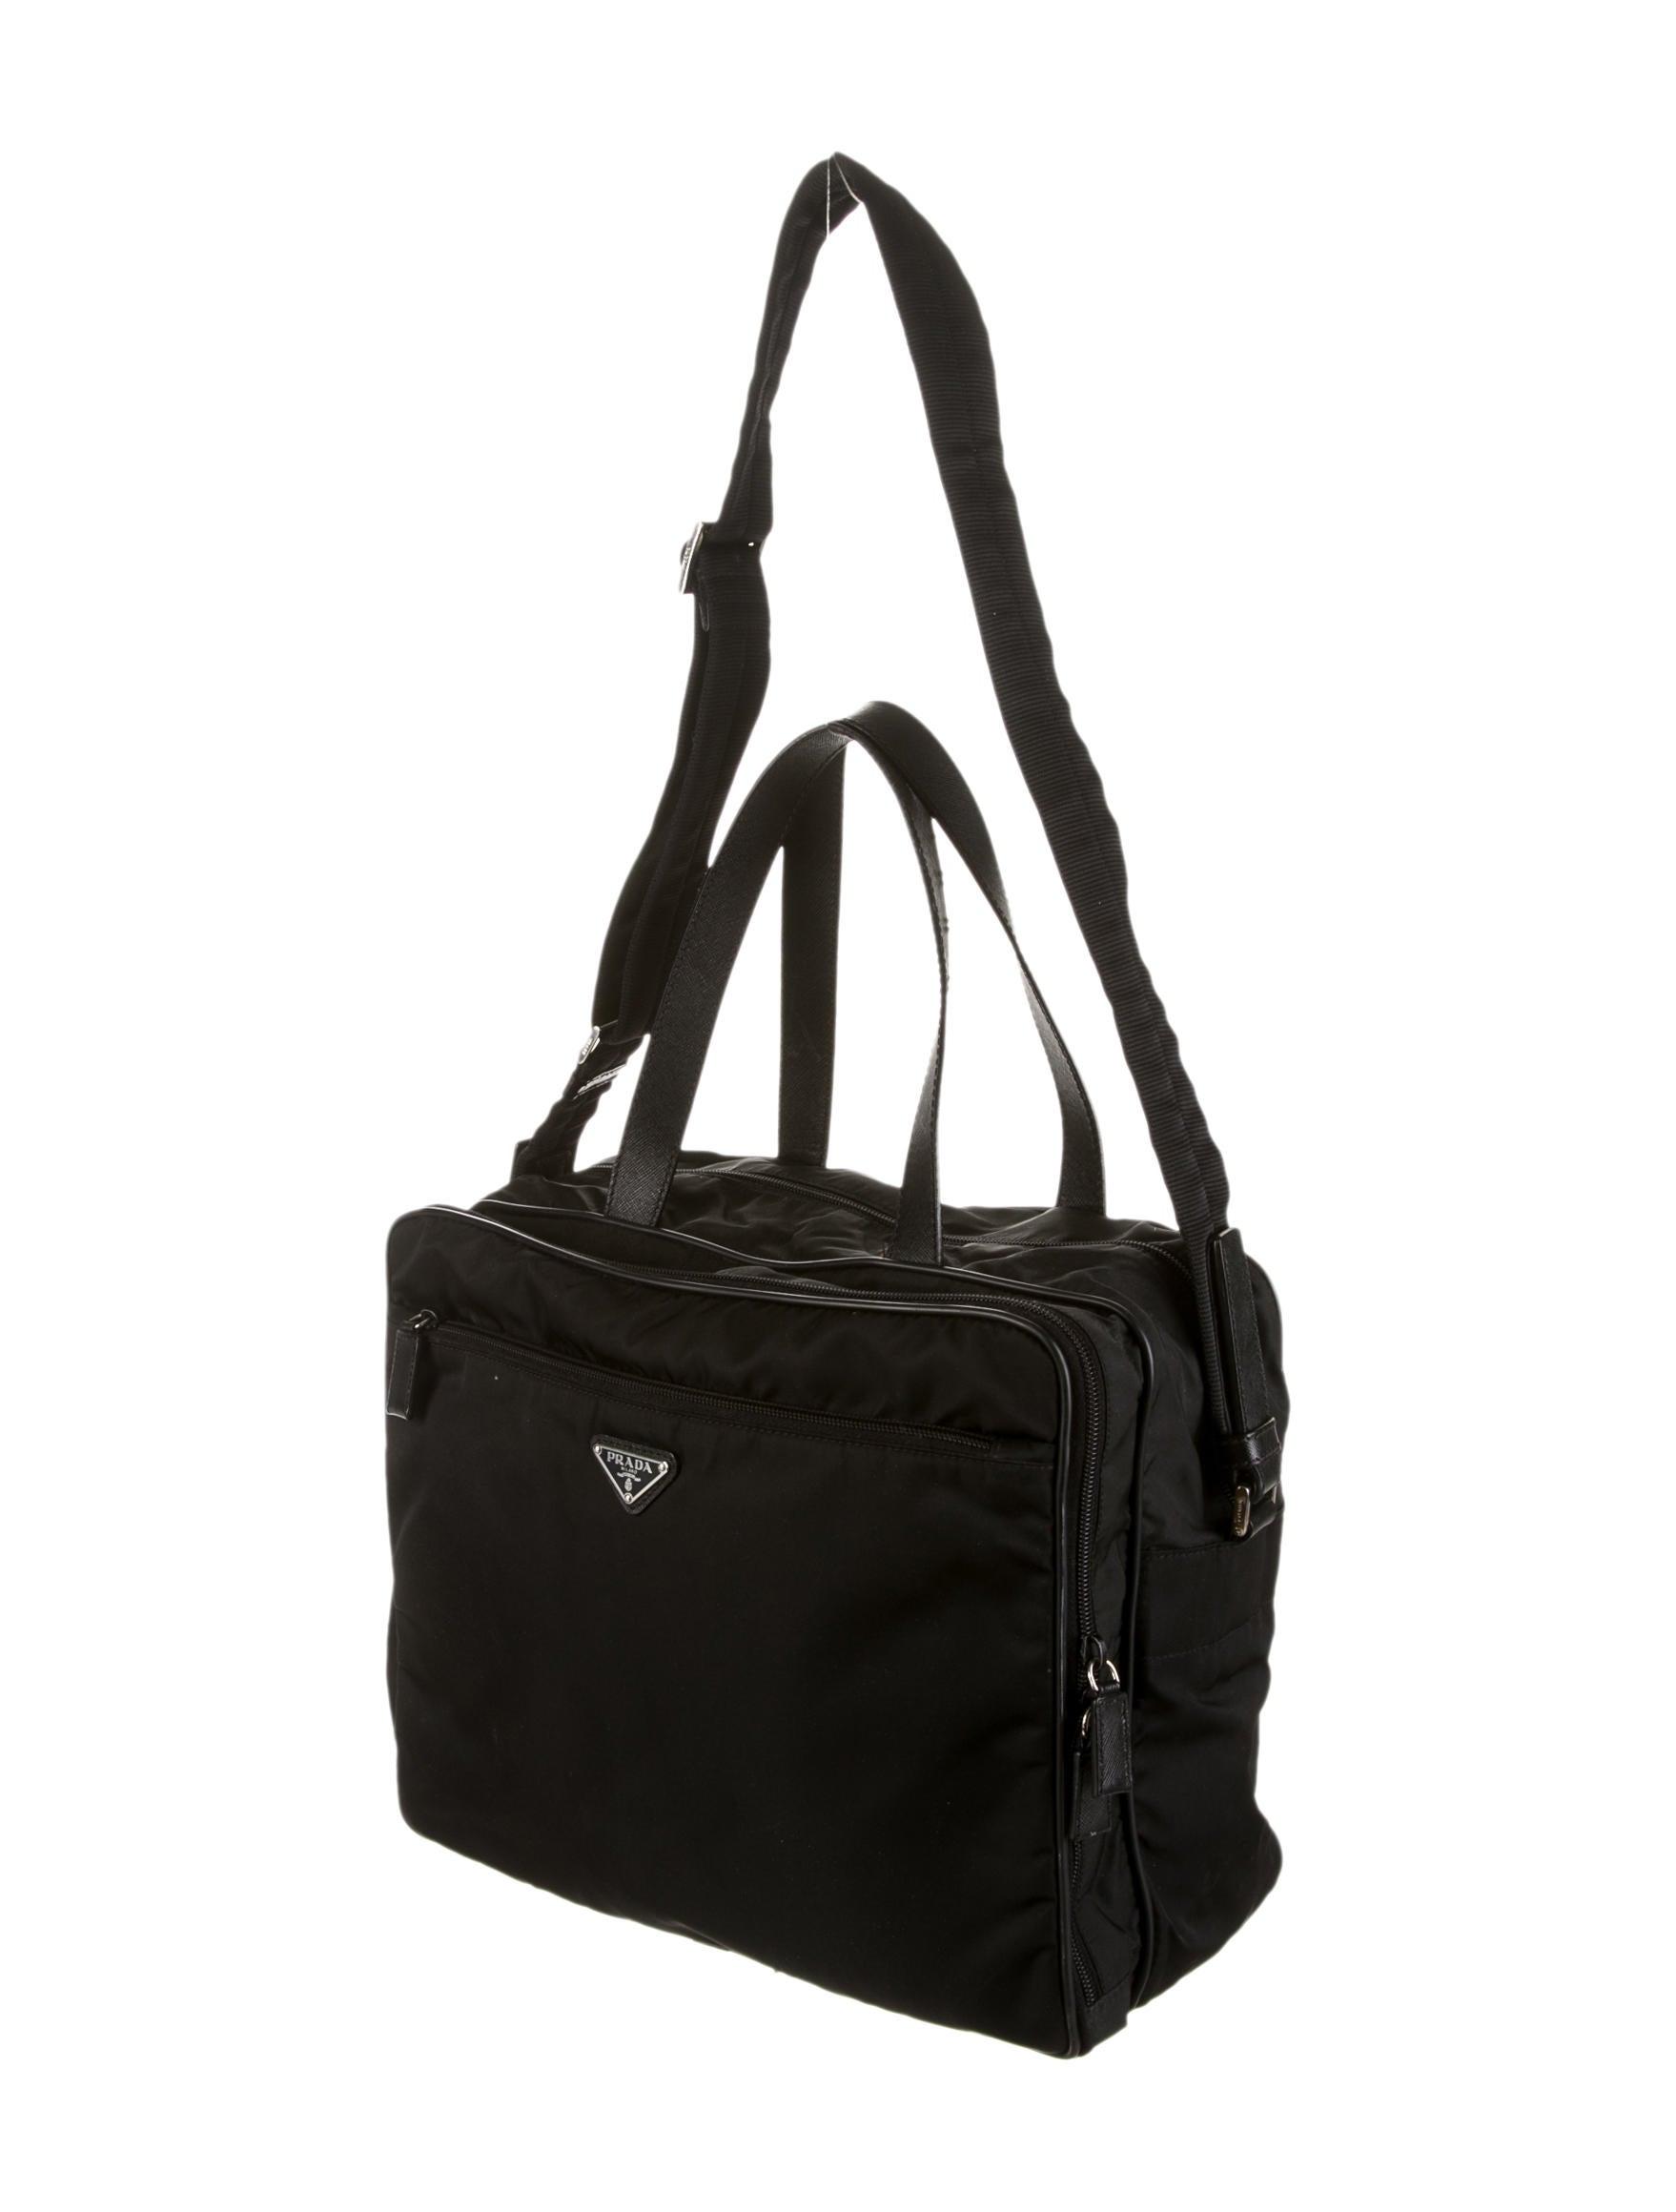 prada pink backpack - Prada Tessuto Baby Bag - Handbags - PRA56855 | The RealReal